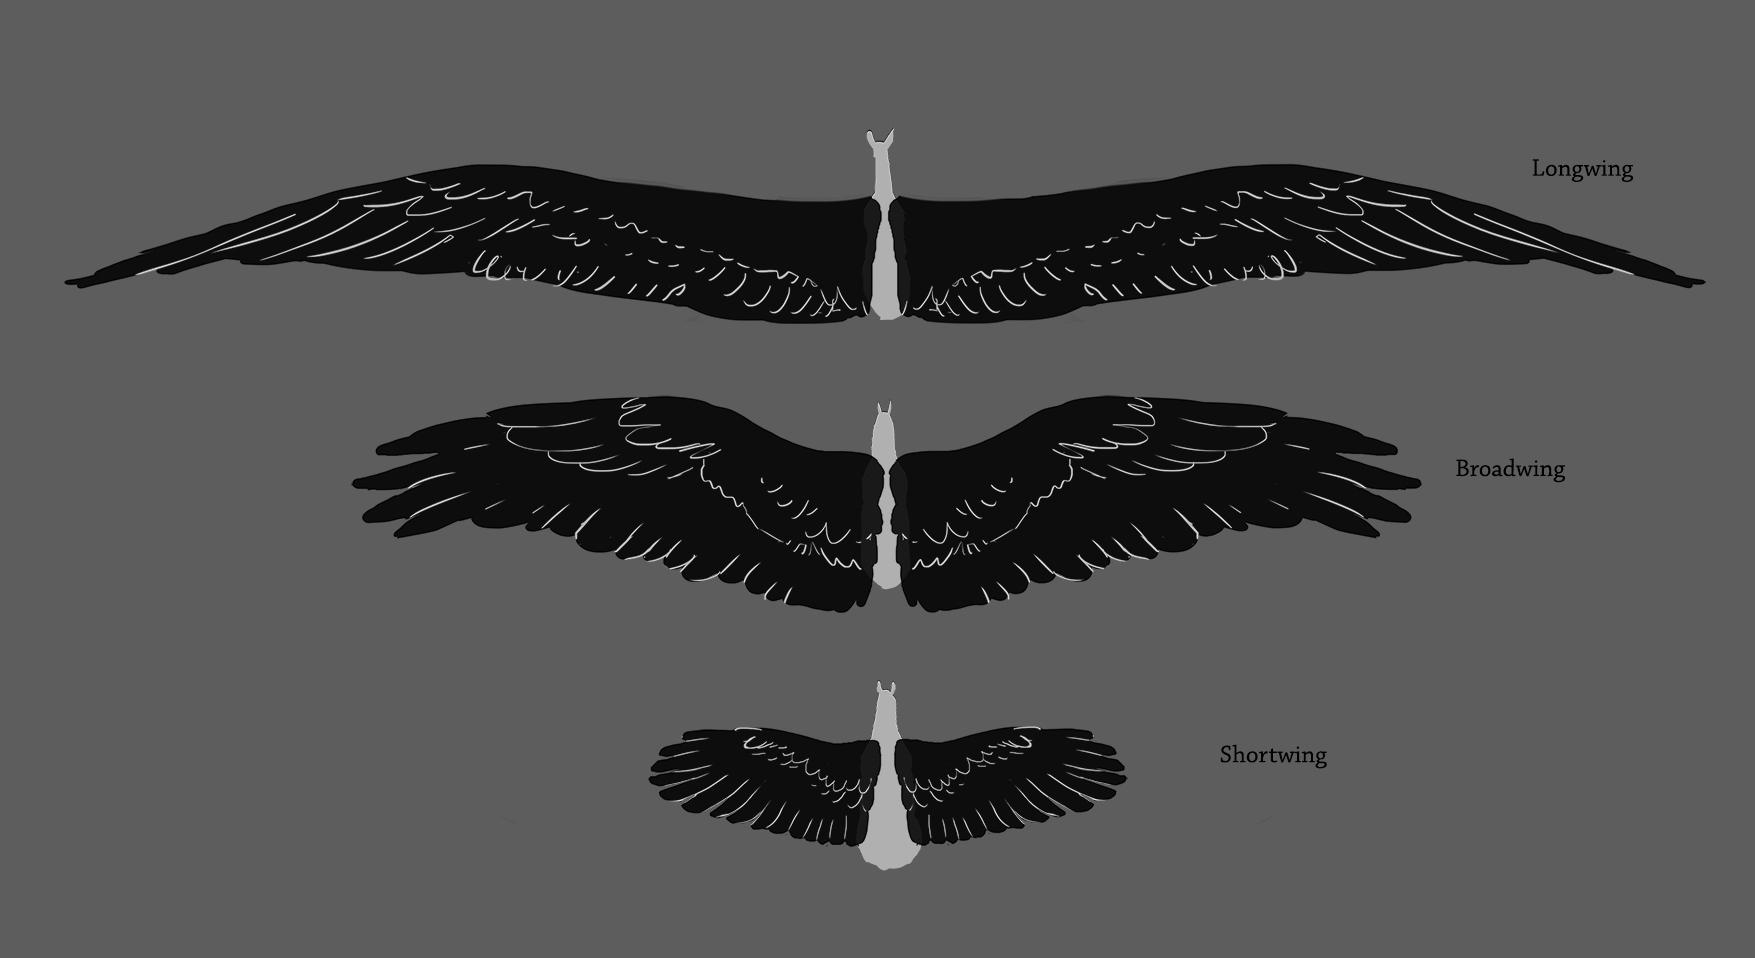 wing sizes relative 001 web.jpg